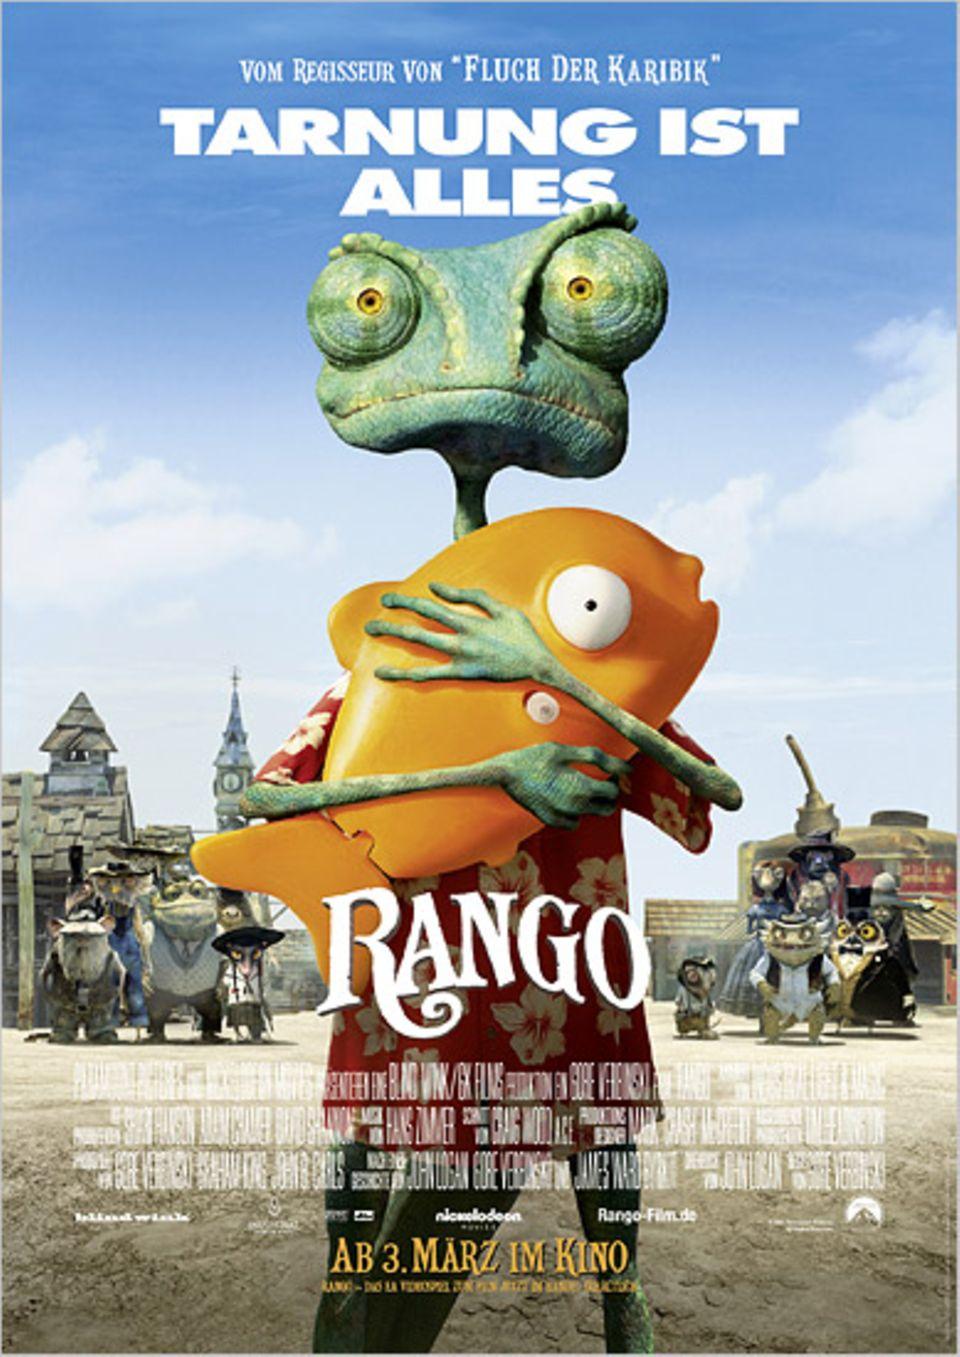 Kino: Kinotipp: Rango